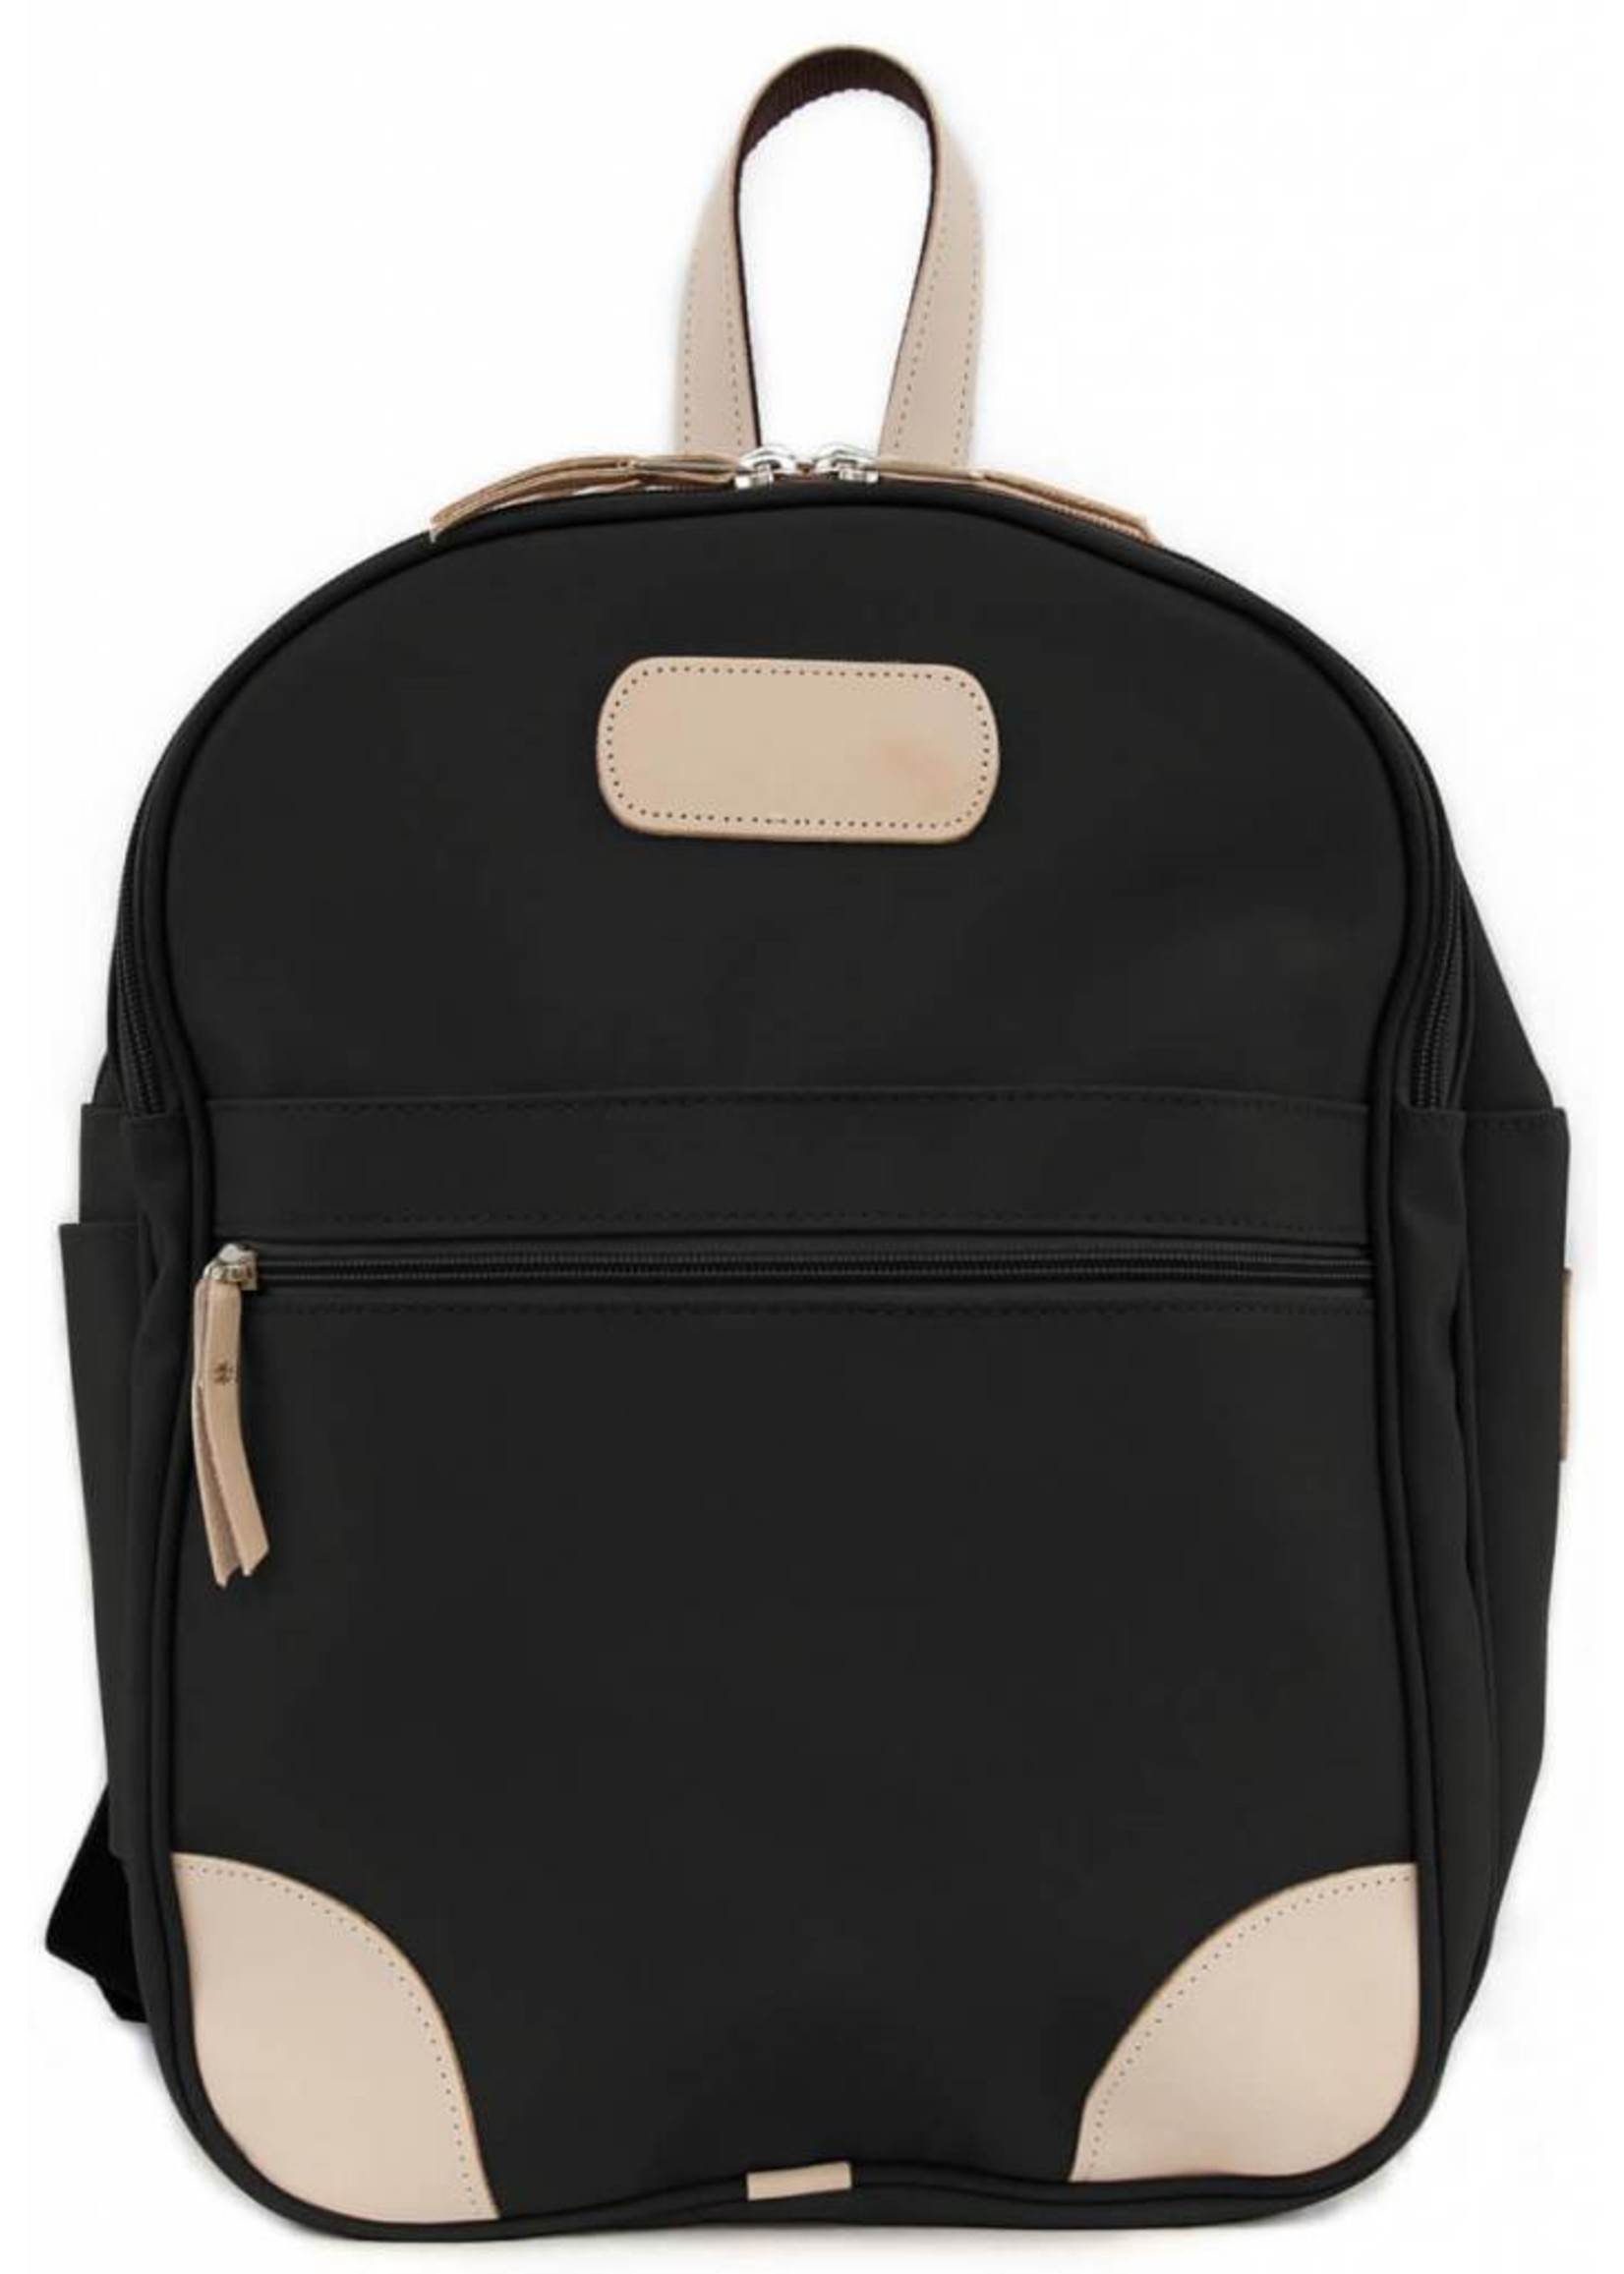 Jon Hart Backpack, Large